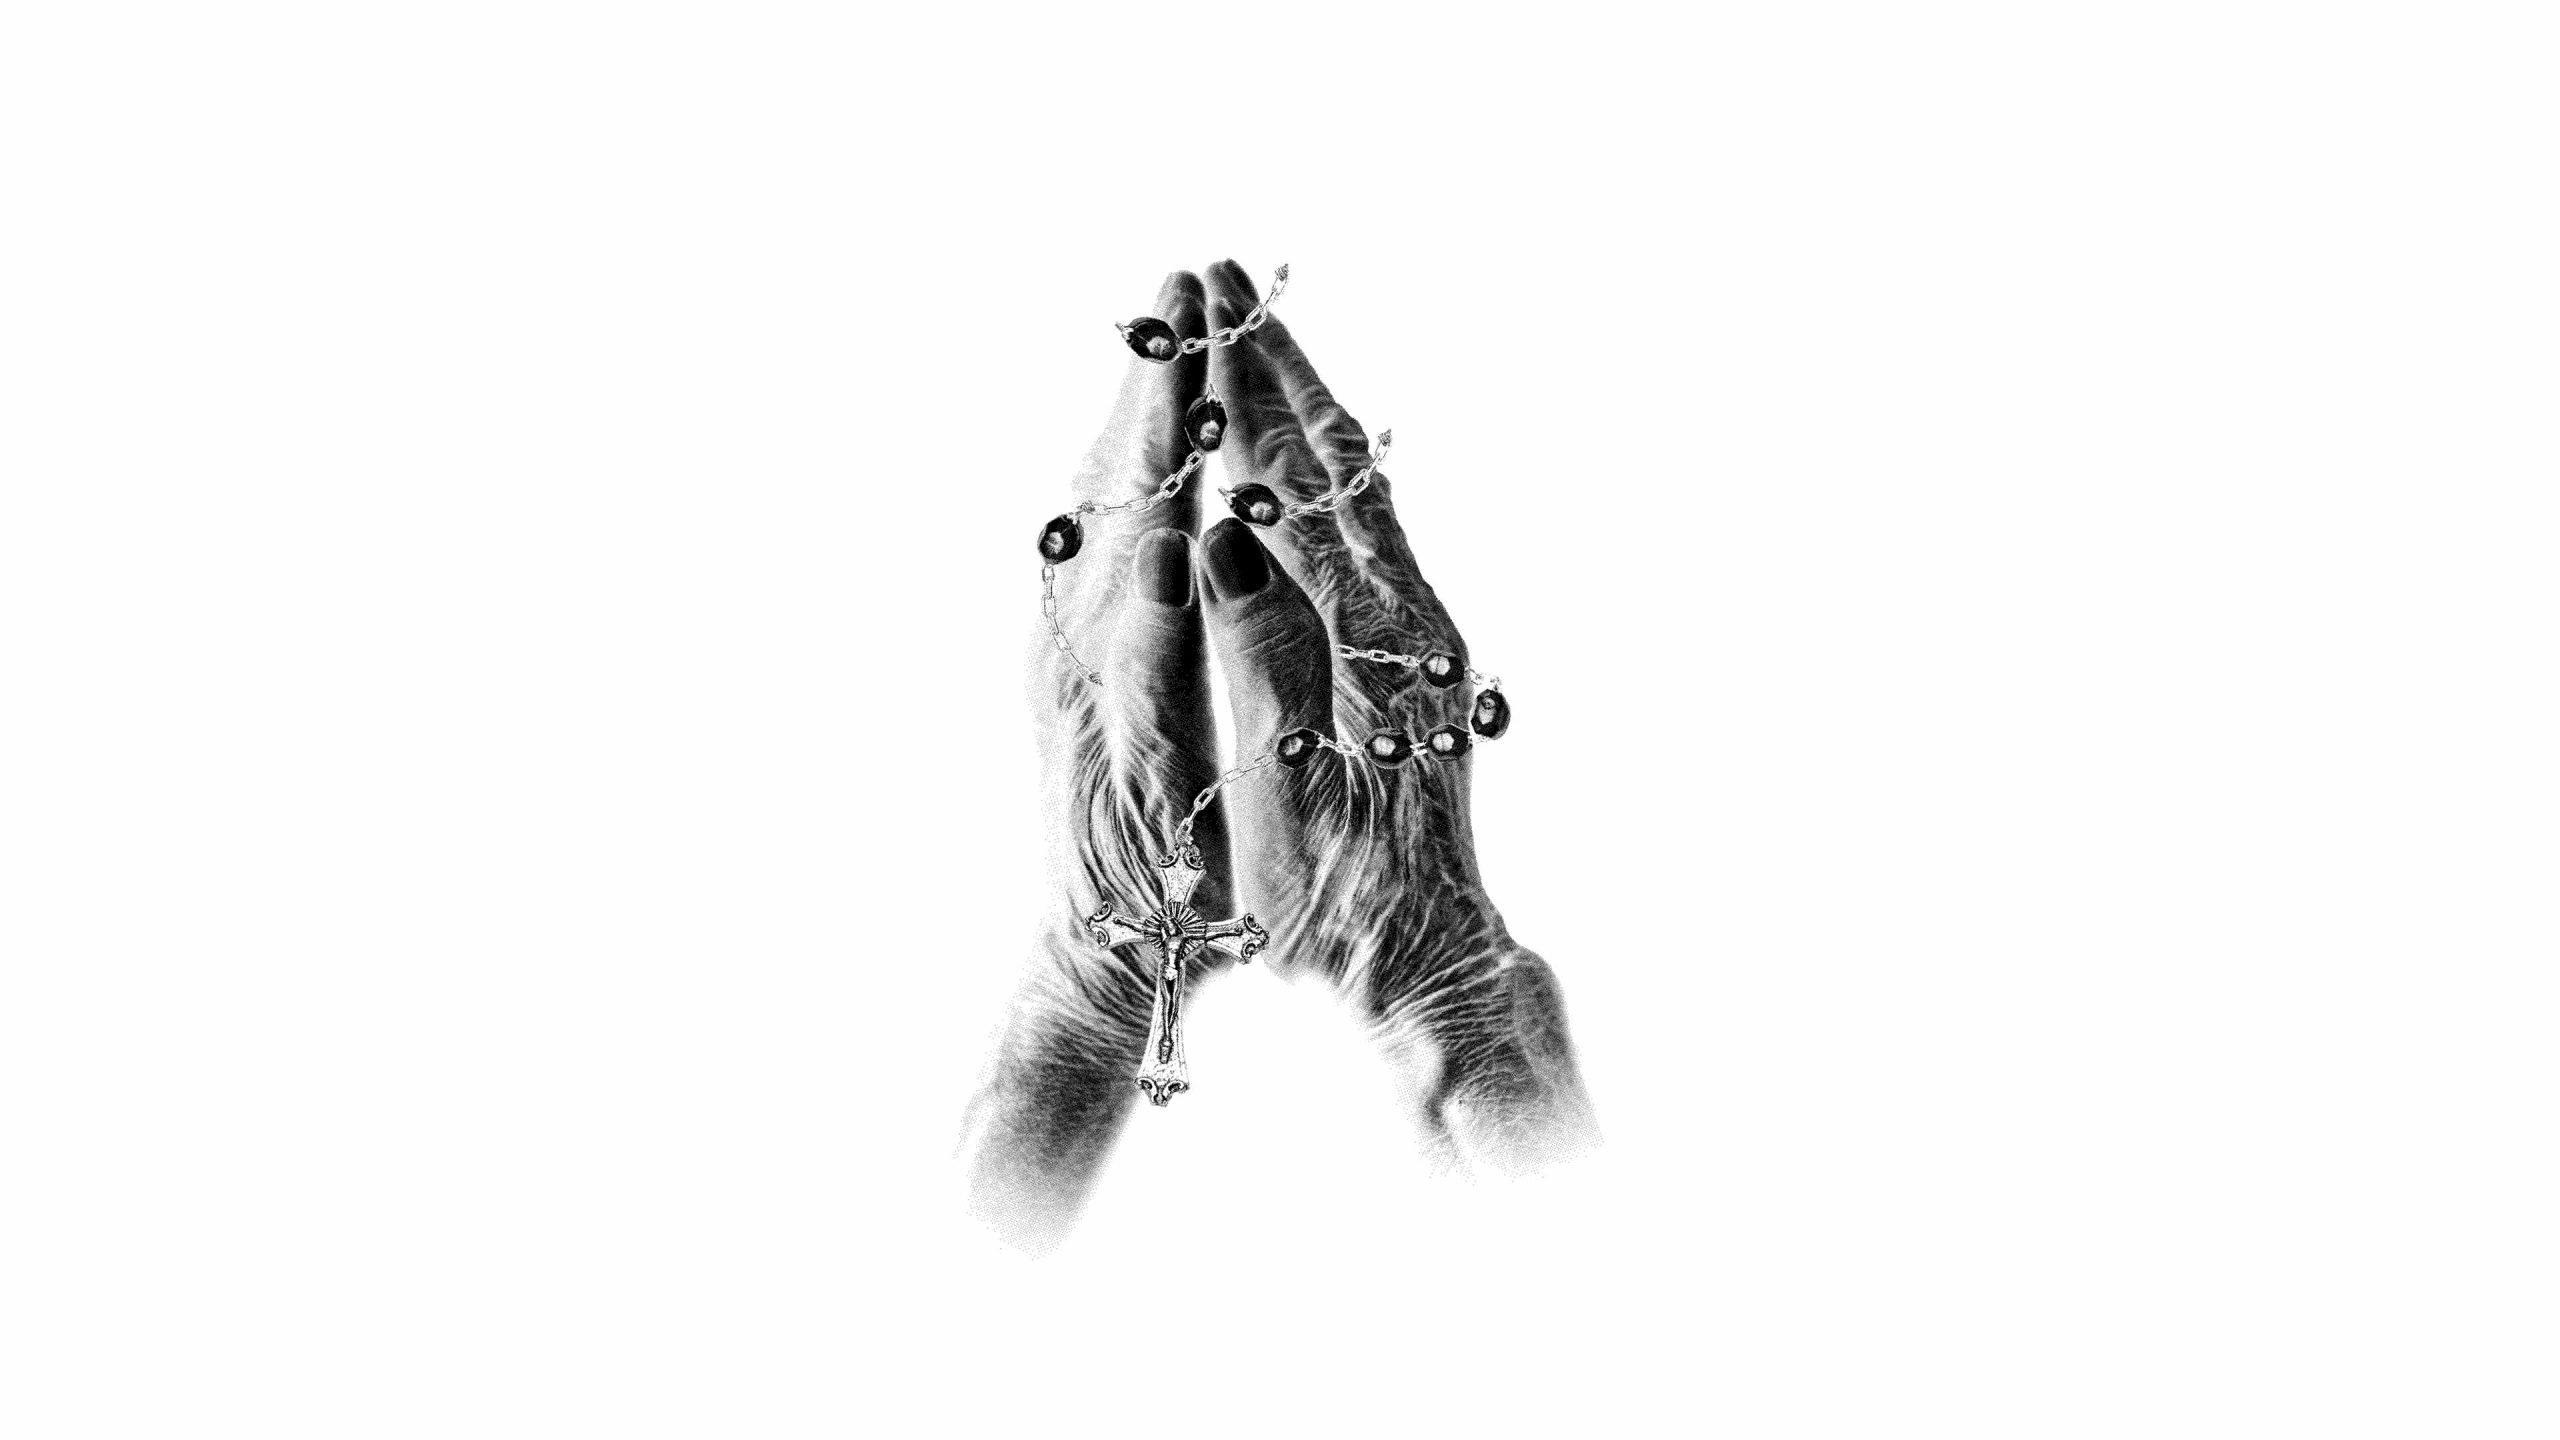 GUE-PEQUENO-SINATRA-merch-graphics-hands-01